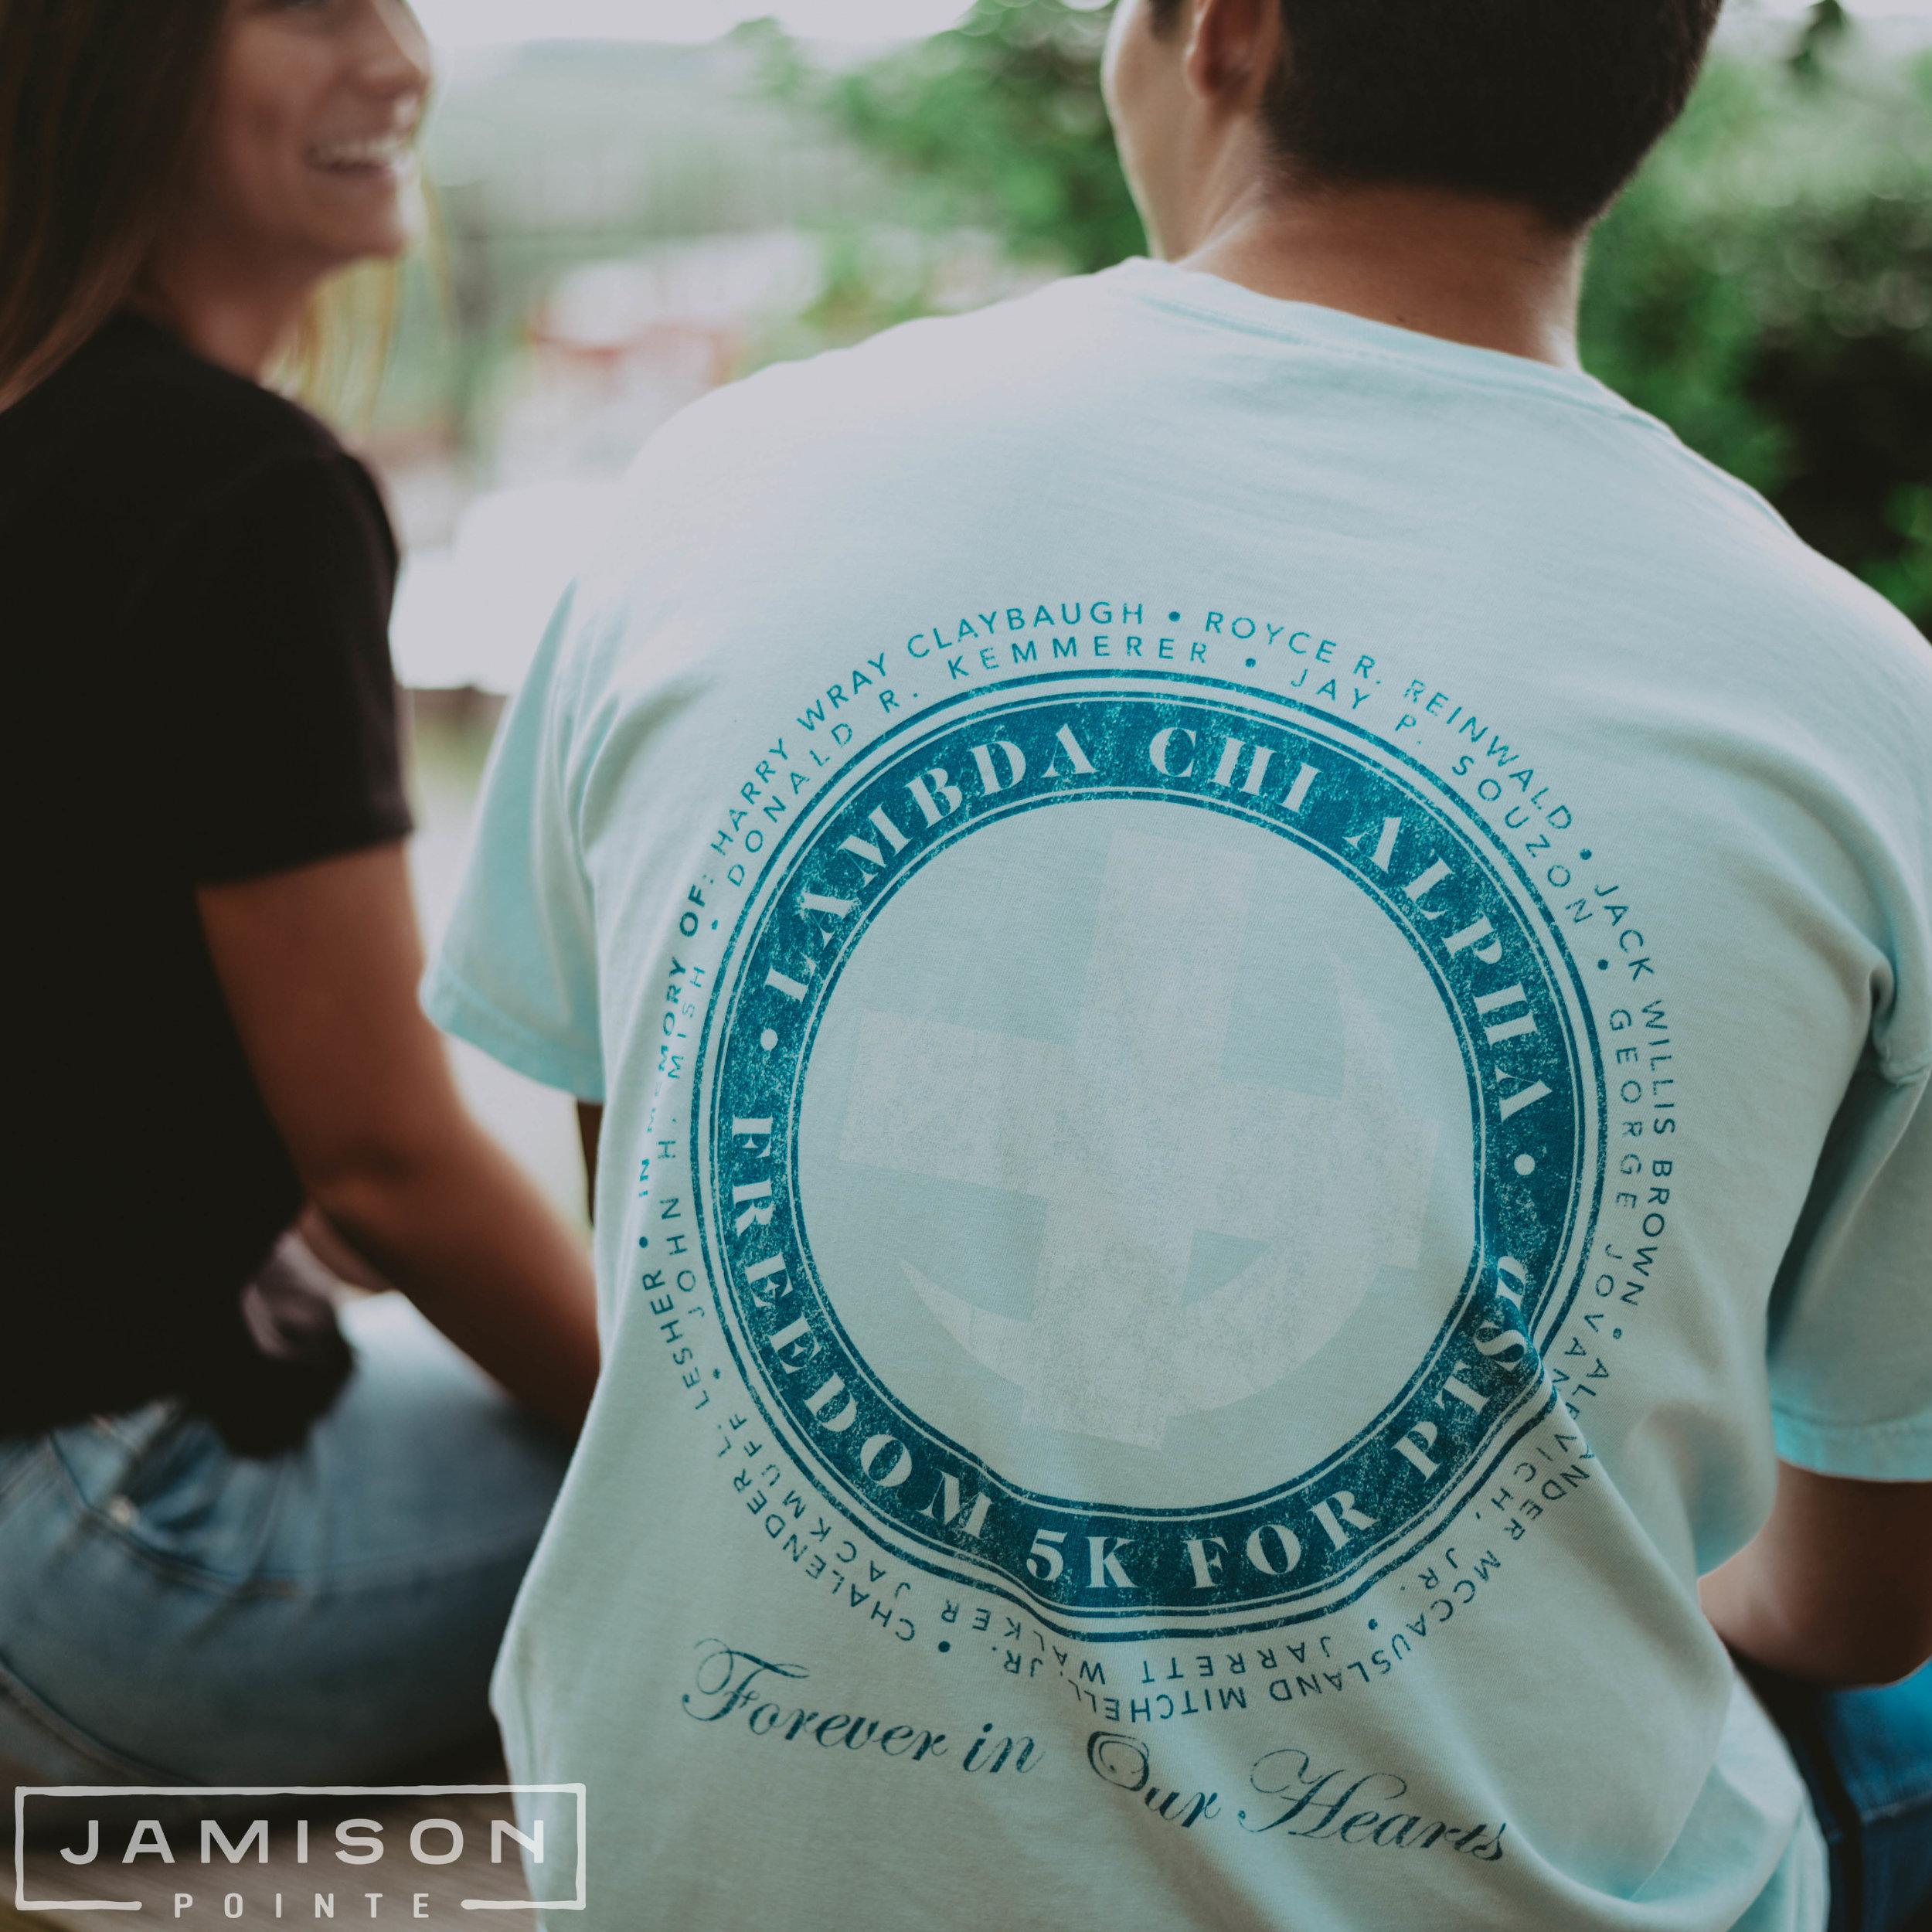 Lambda Chi Philanthropy Tee